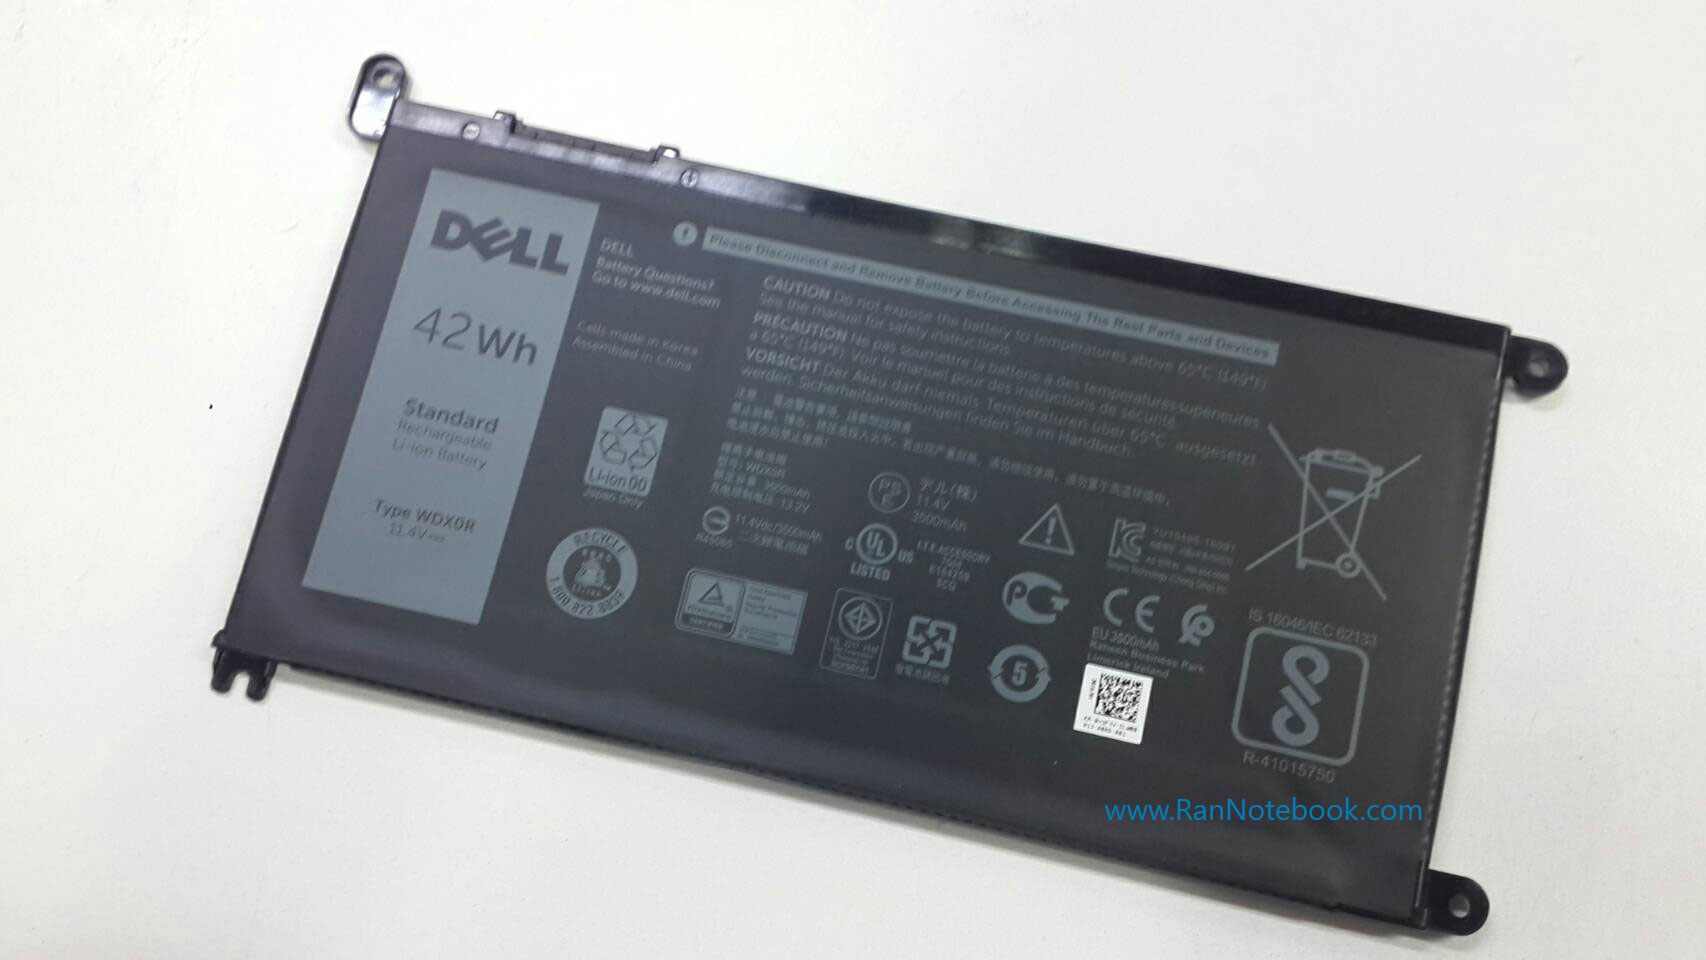 Battery Dell inspiron 5567 inspiron 15 5567 ของแท้ ประกันศูนย์ Dell ราคา ไม่แพง